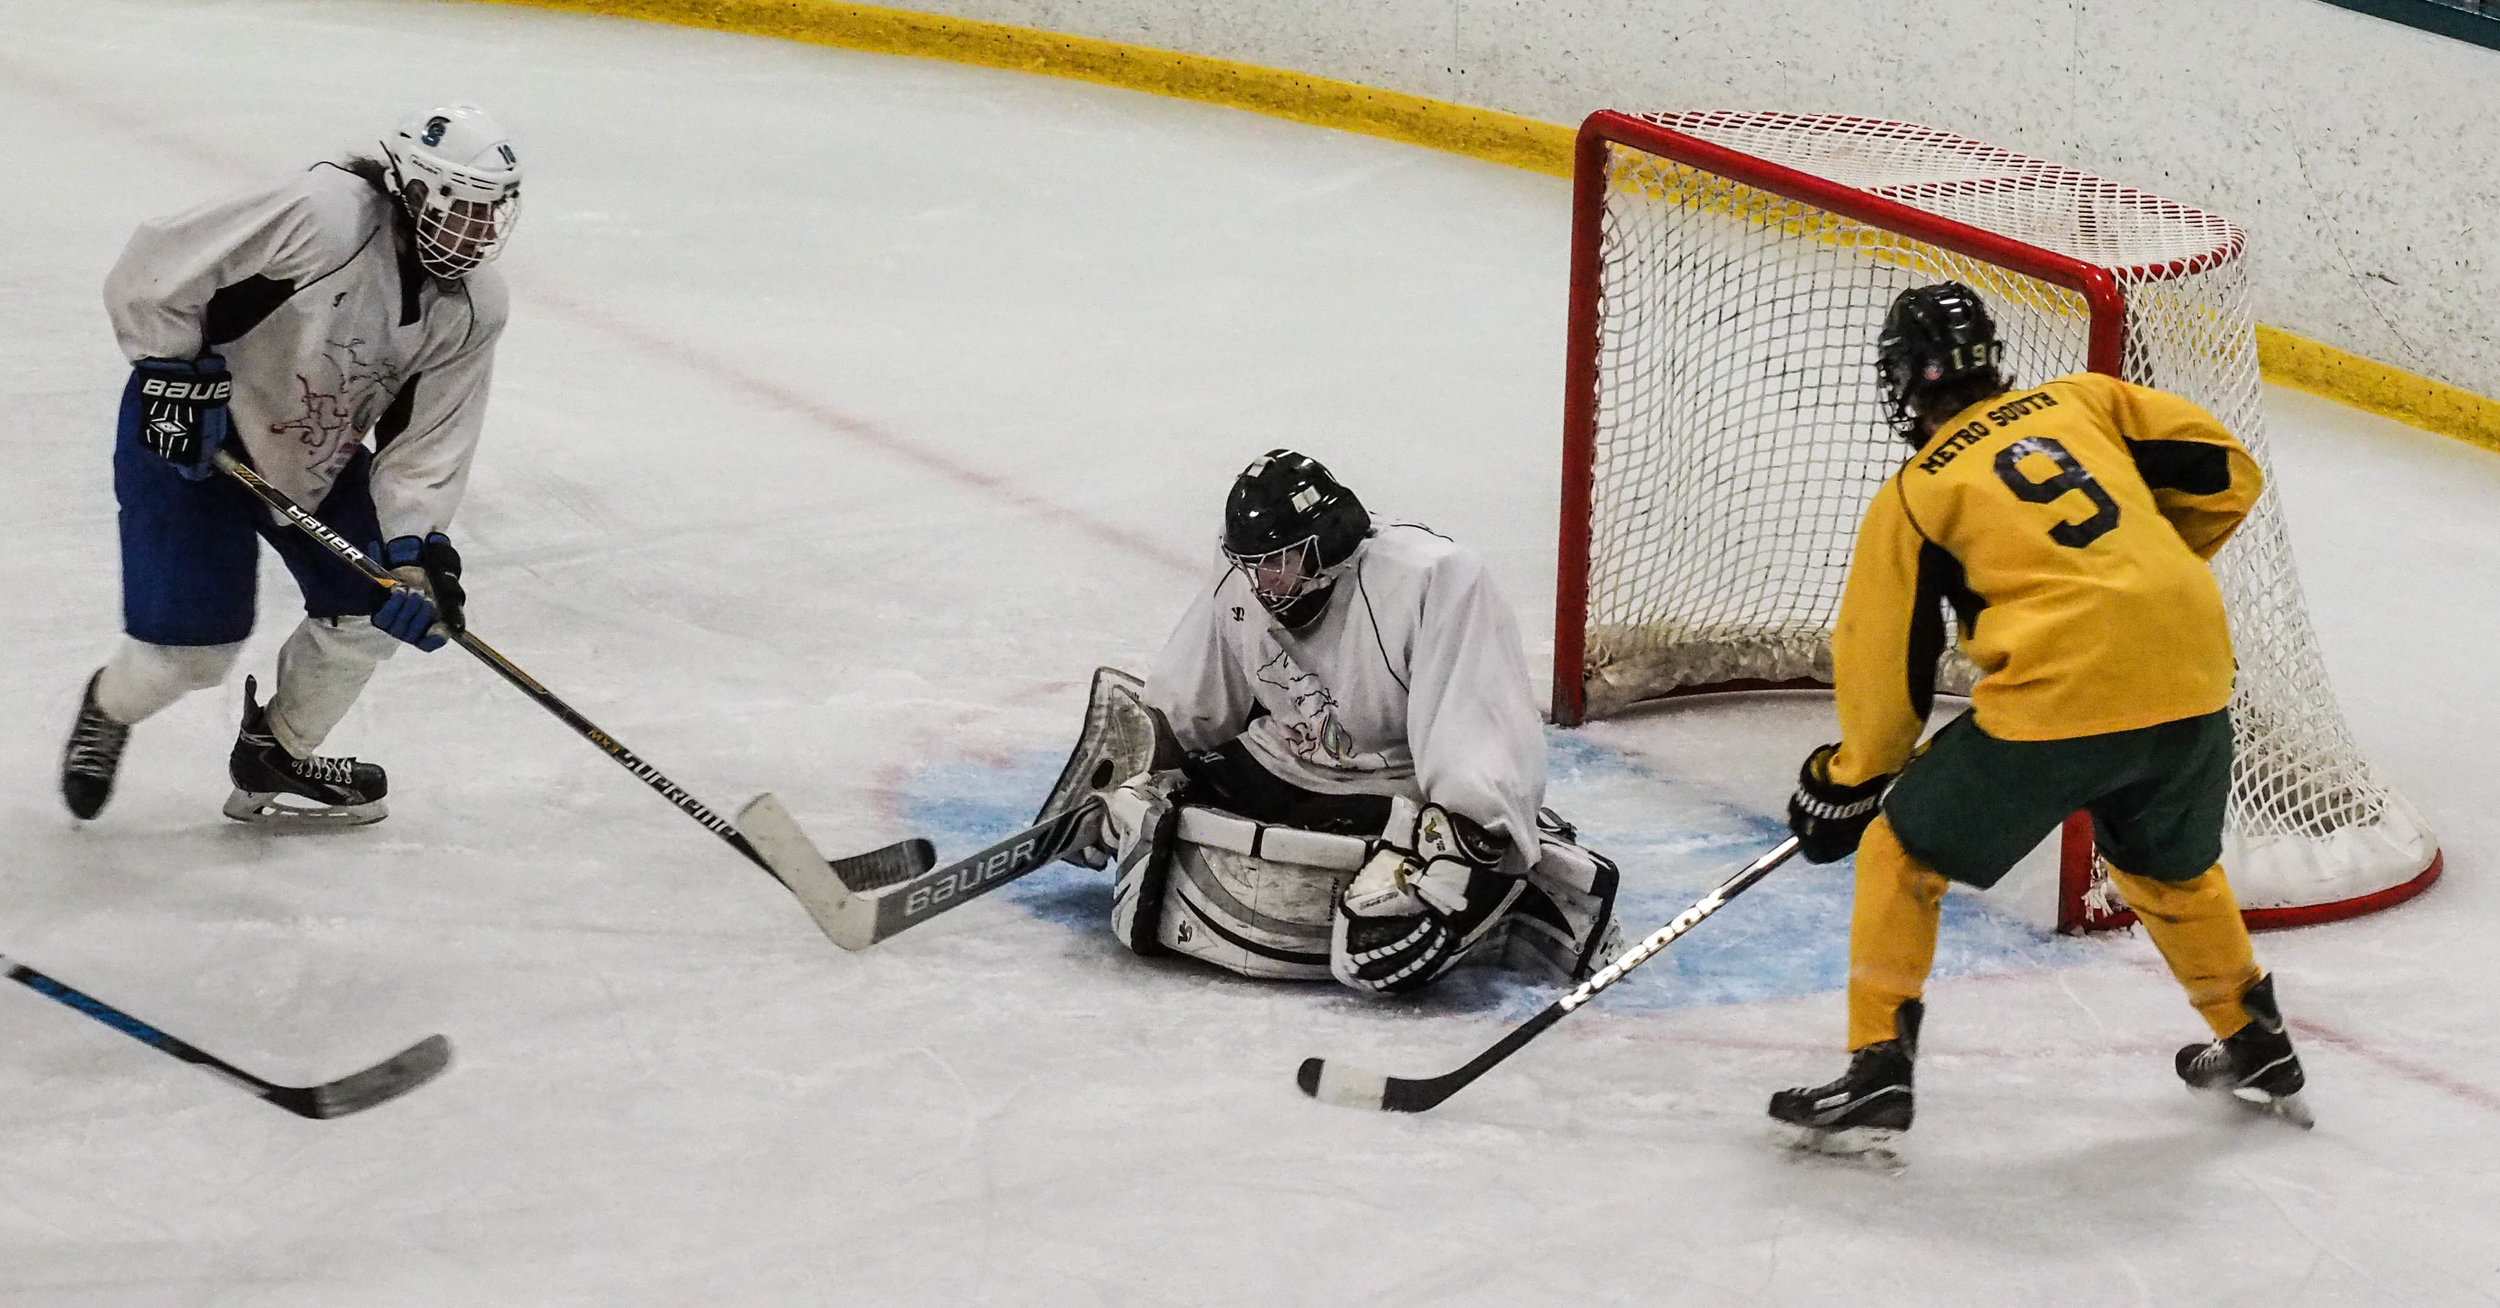 2015 State Games Summer Hockey-31.jpg